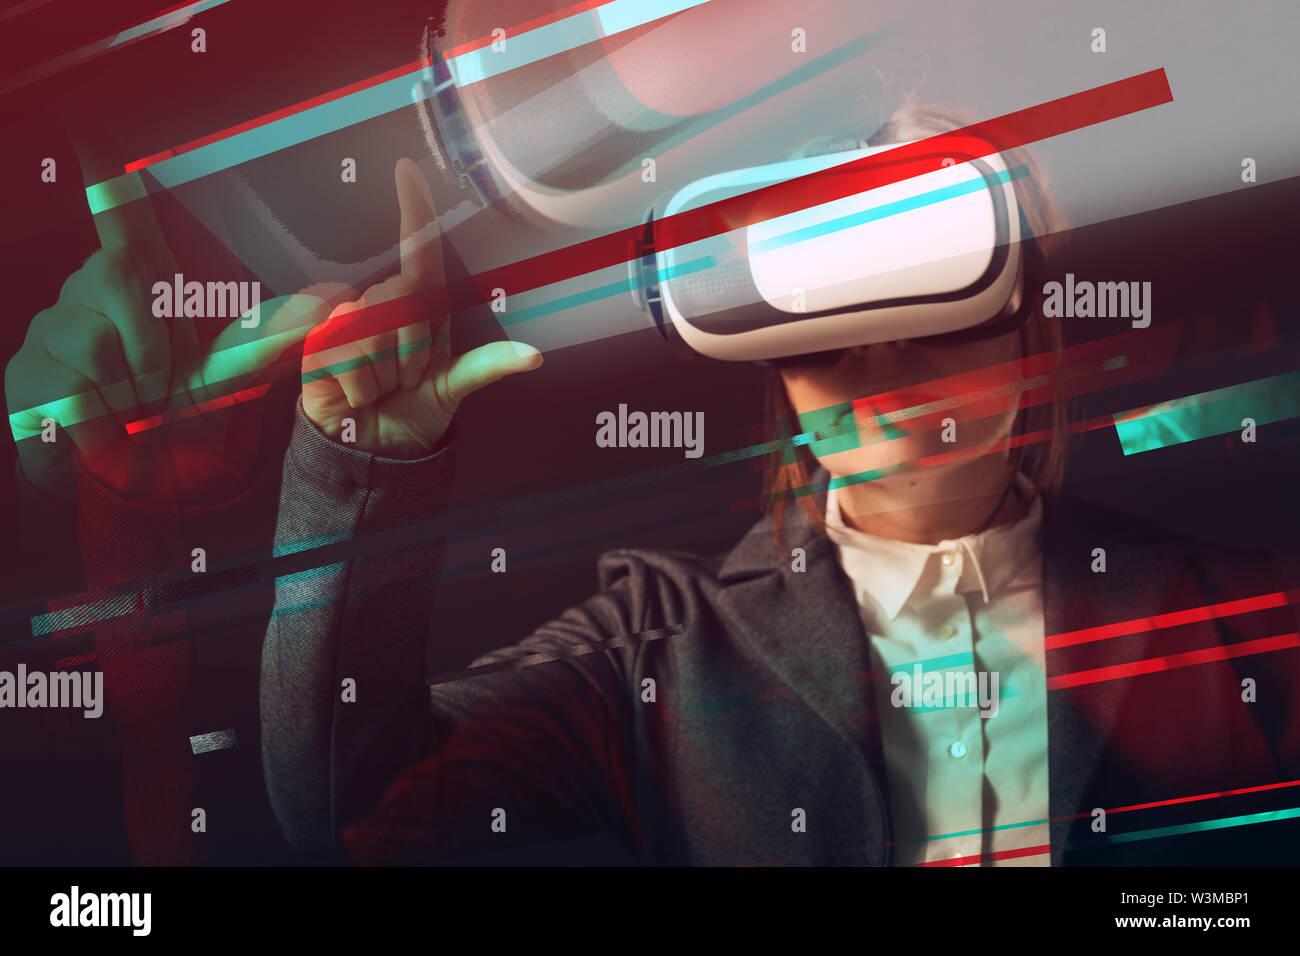 Businesswoman wearing virtual reality headset, digitally enhanced image - Stock Image